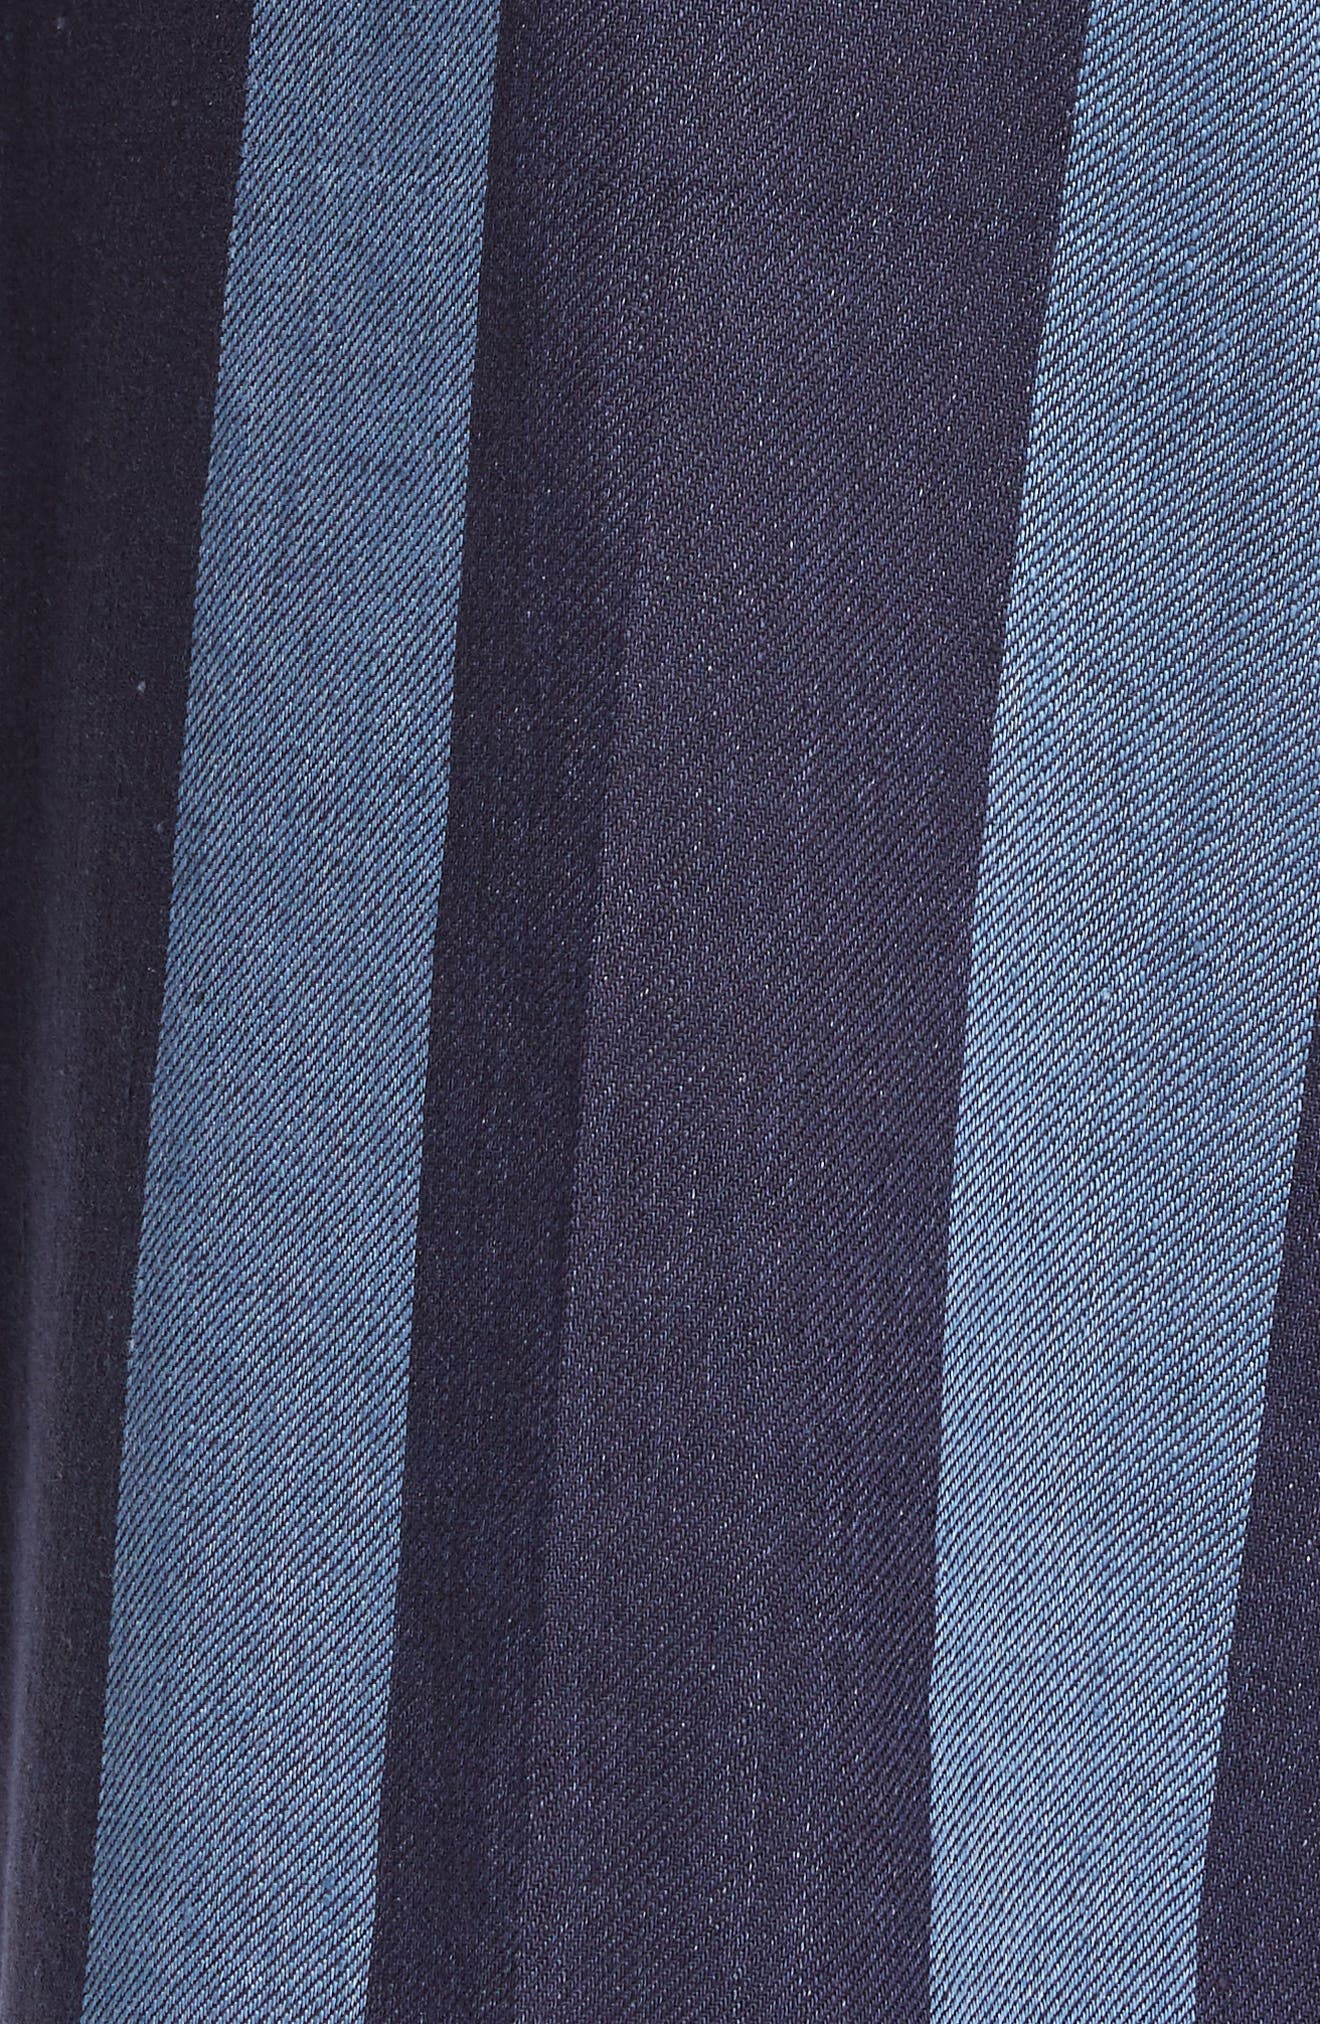 TOMMY X ZENDAYA, Stripe Denim Pants, Alternate thumbnail 6, color, STRIPED DENIM